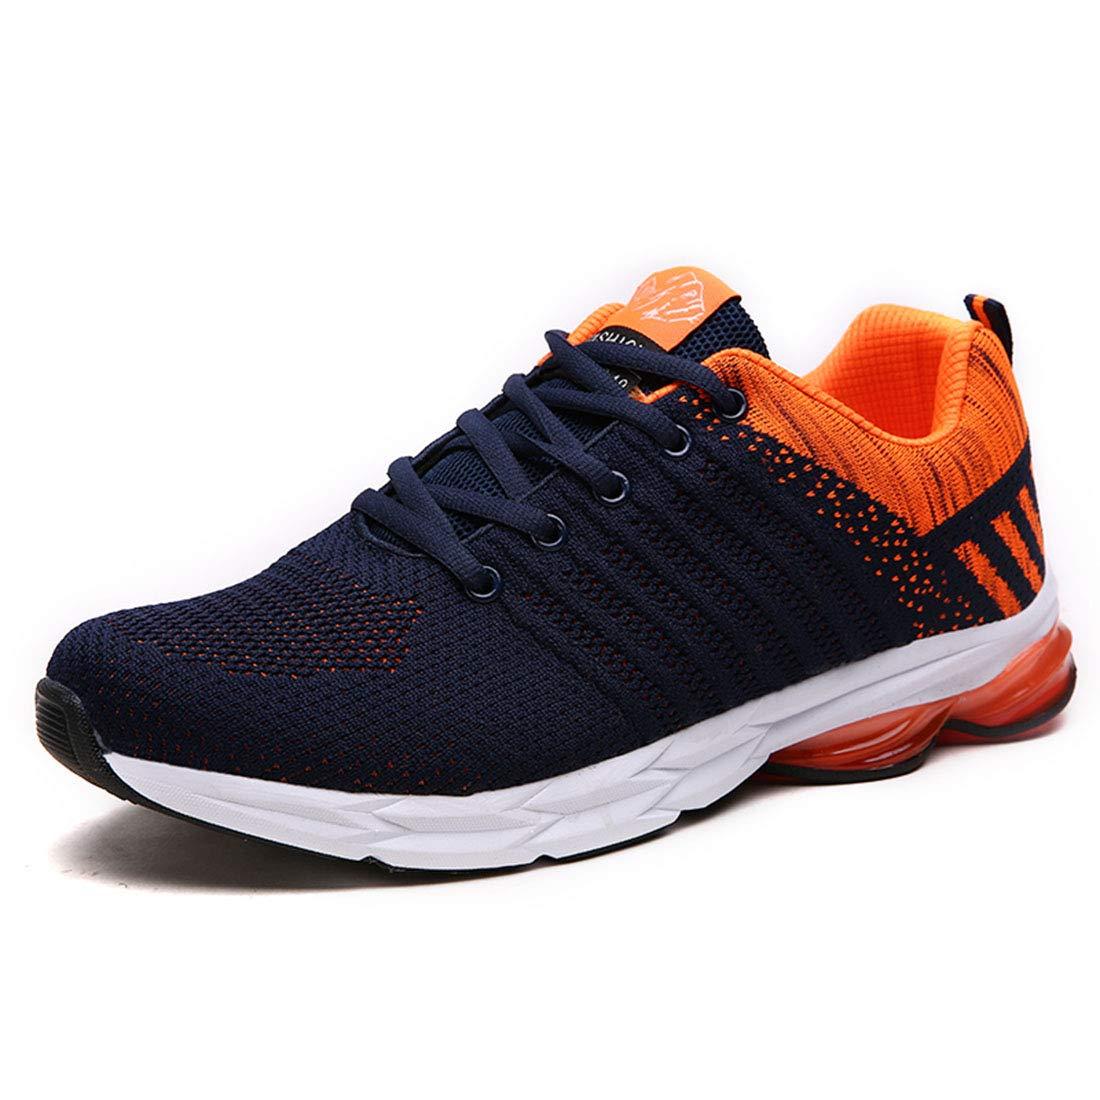 para Hombres Montaña y Asfalto Libre Deporte Running Zapatos Gimnasio Sneakers Transpirables Casual Running Sneakers Resistente Running Zapatillas Zapatillas Deportivas de Malla Ligera